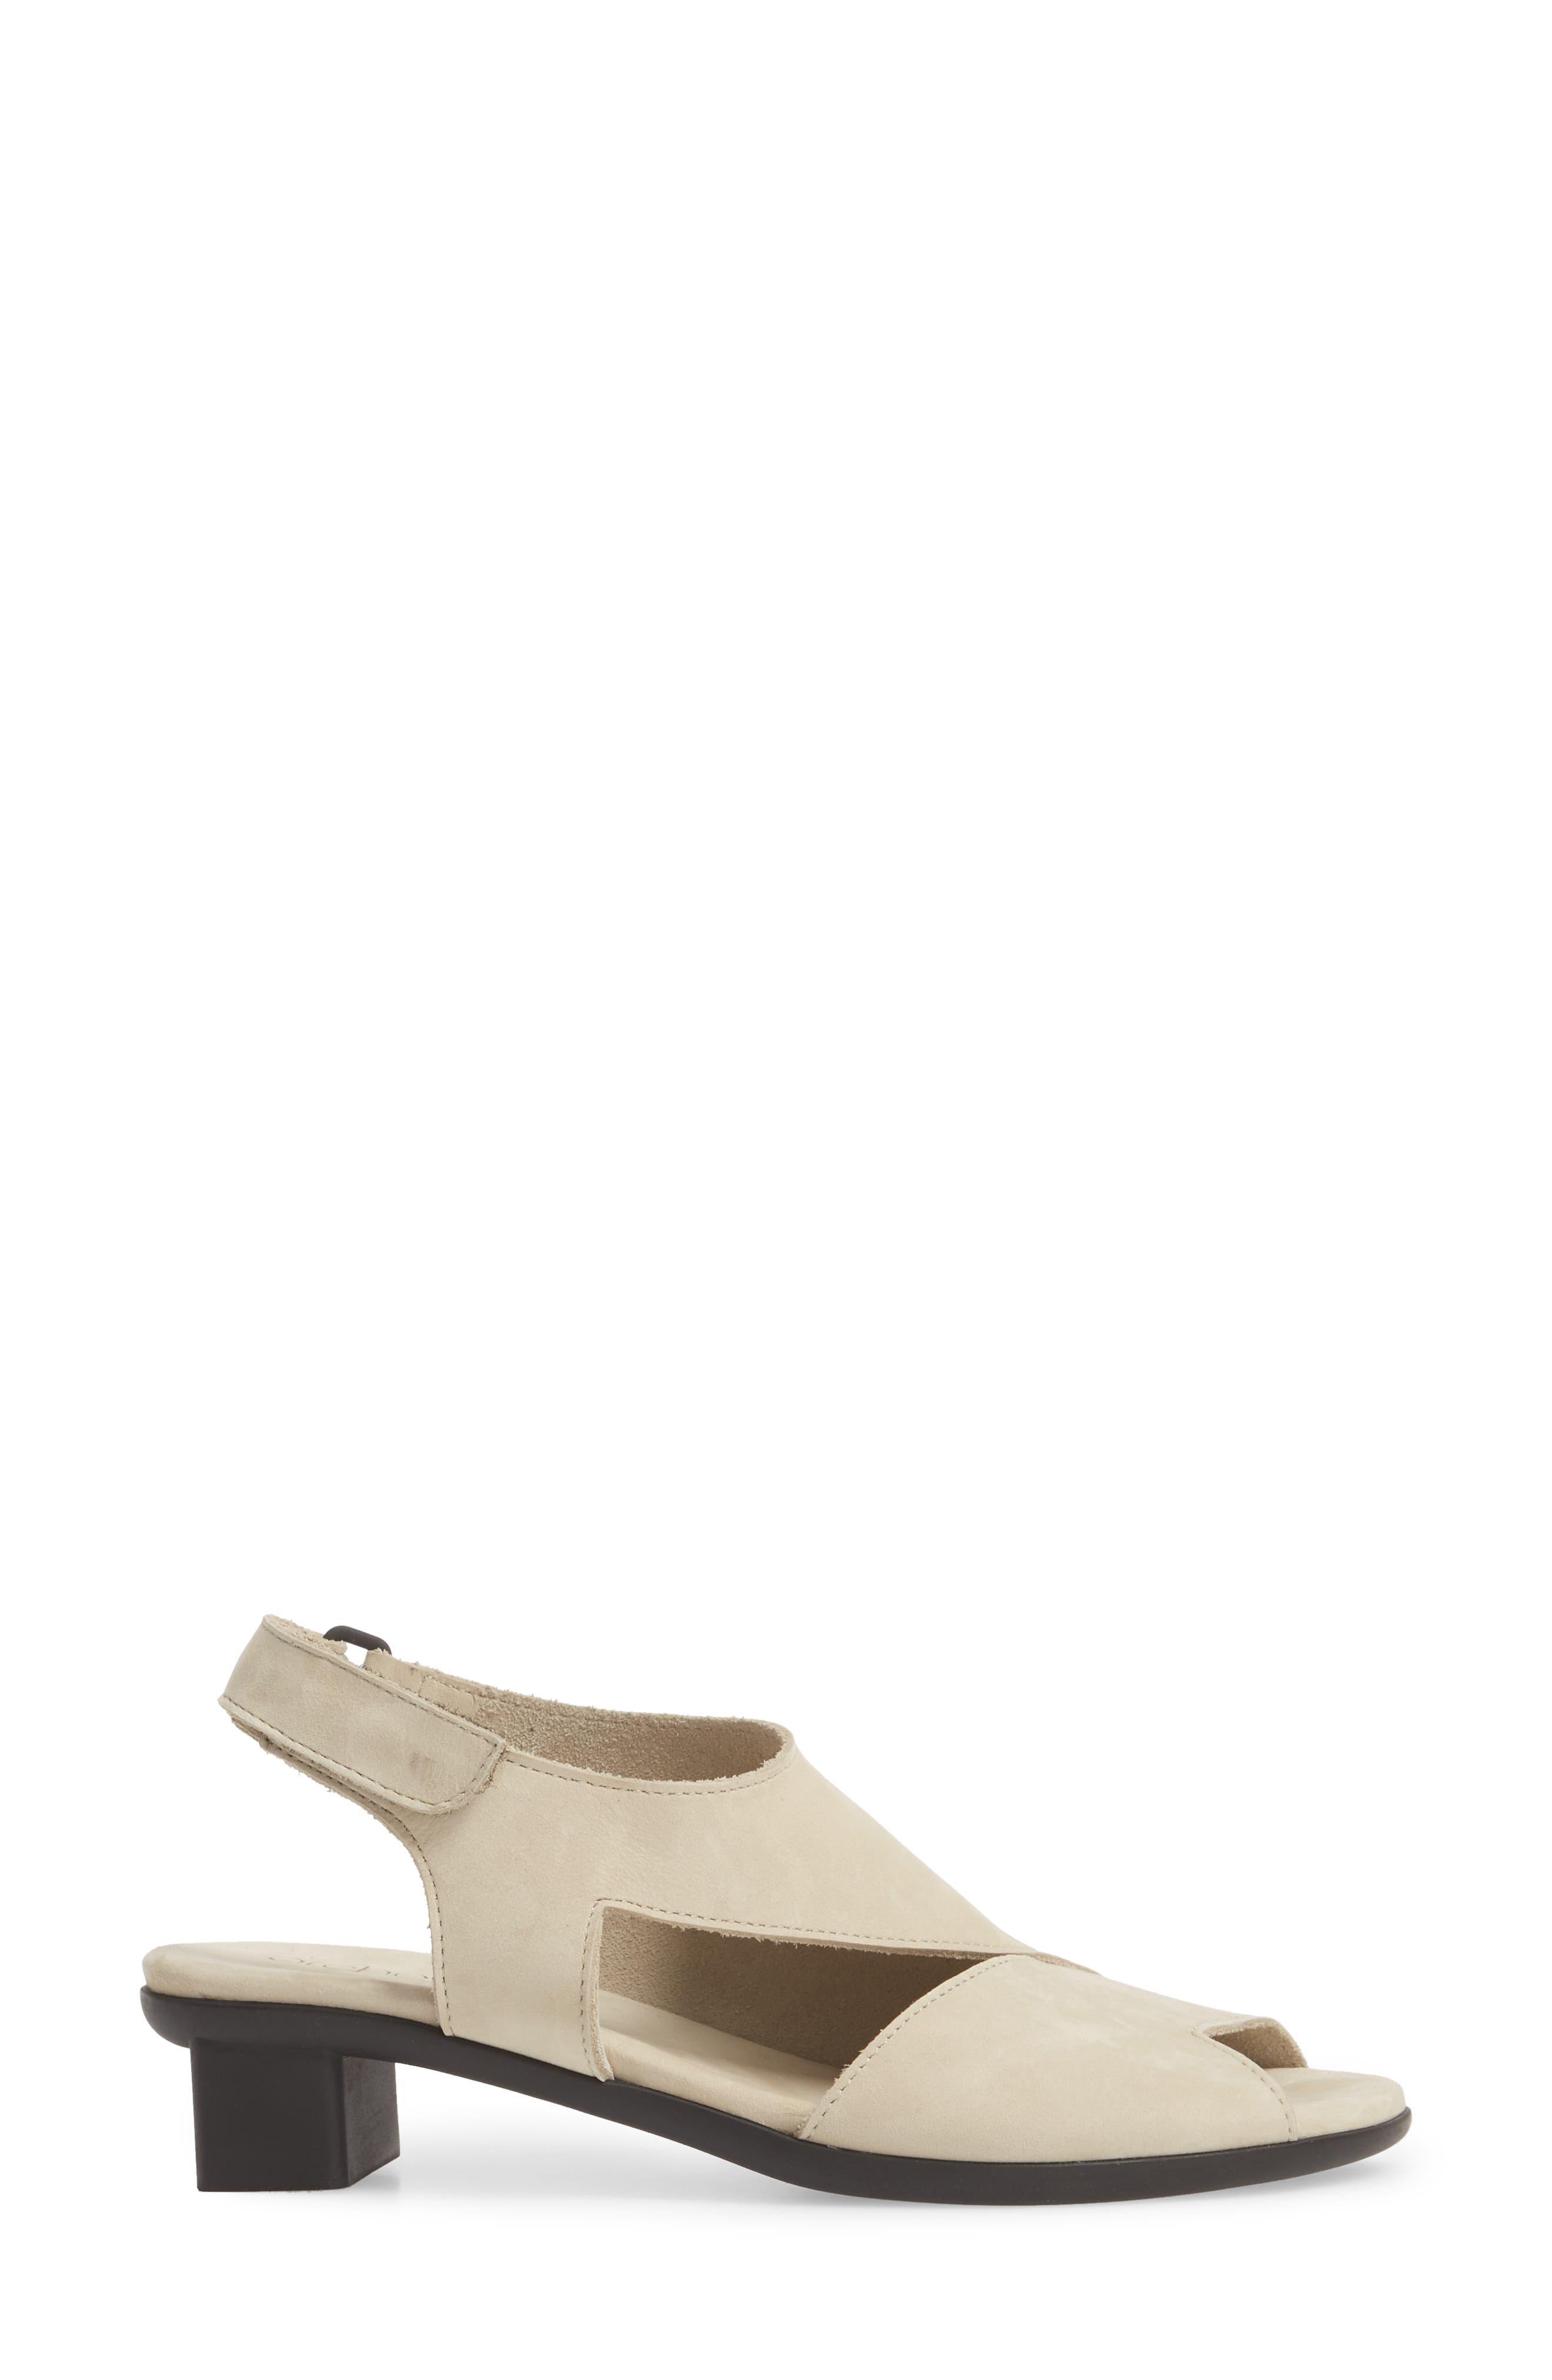 Obibbi Asymmetrical Slingback Sandal,                             Alternate thumbnail 6, color,